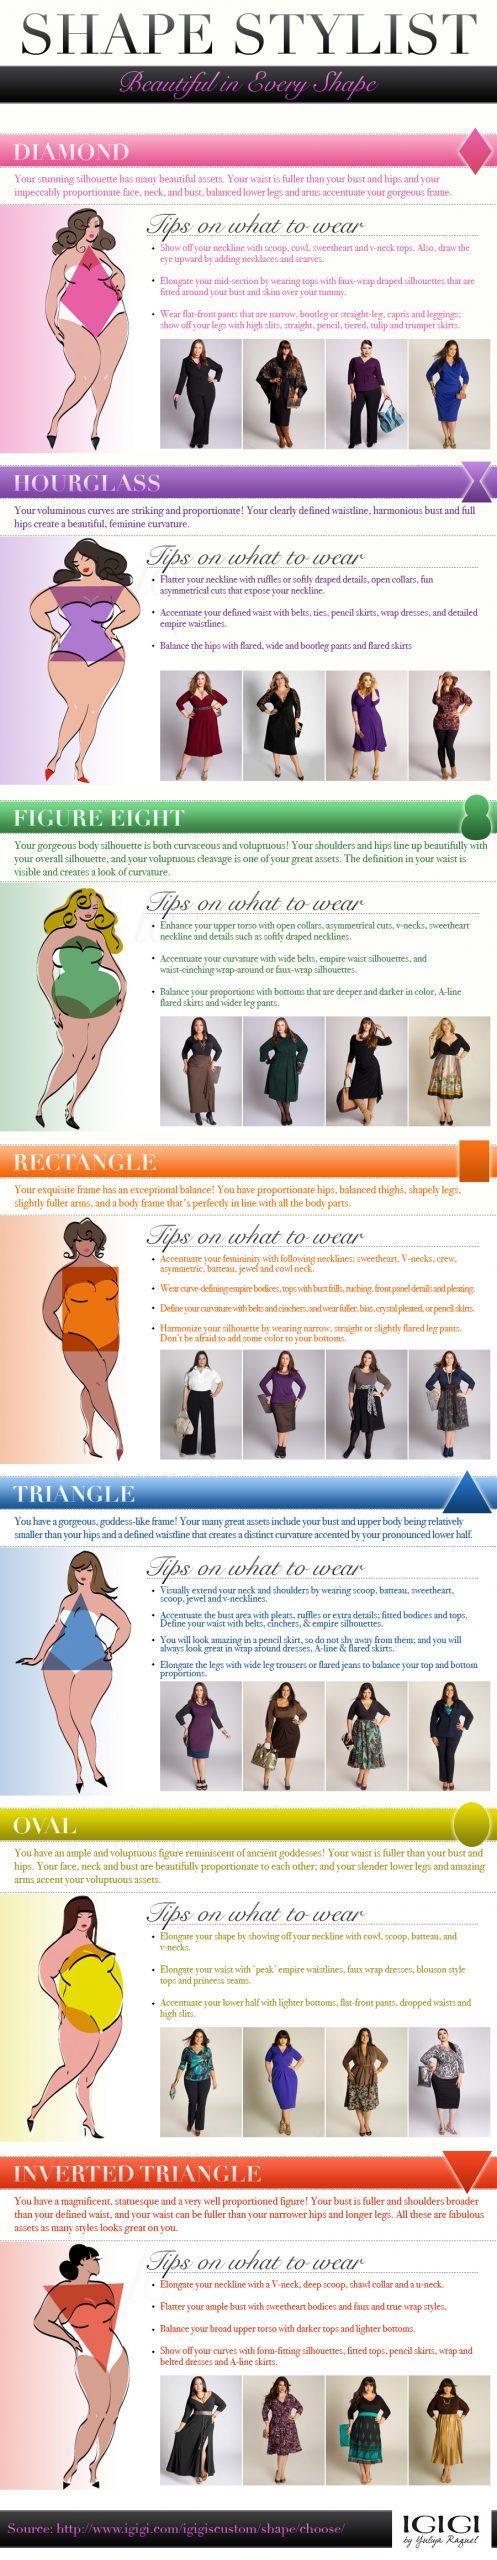 Shape Stylist Infographic